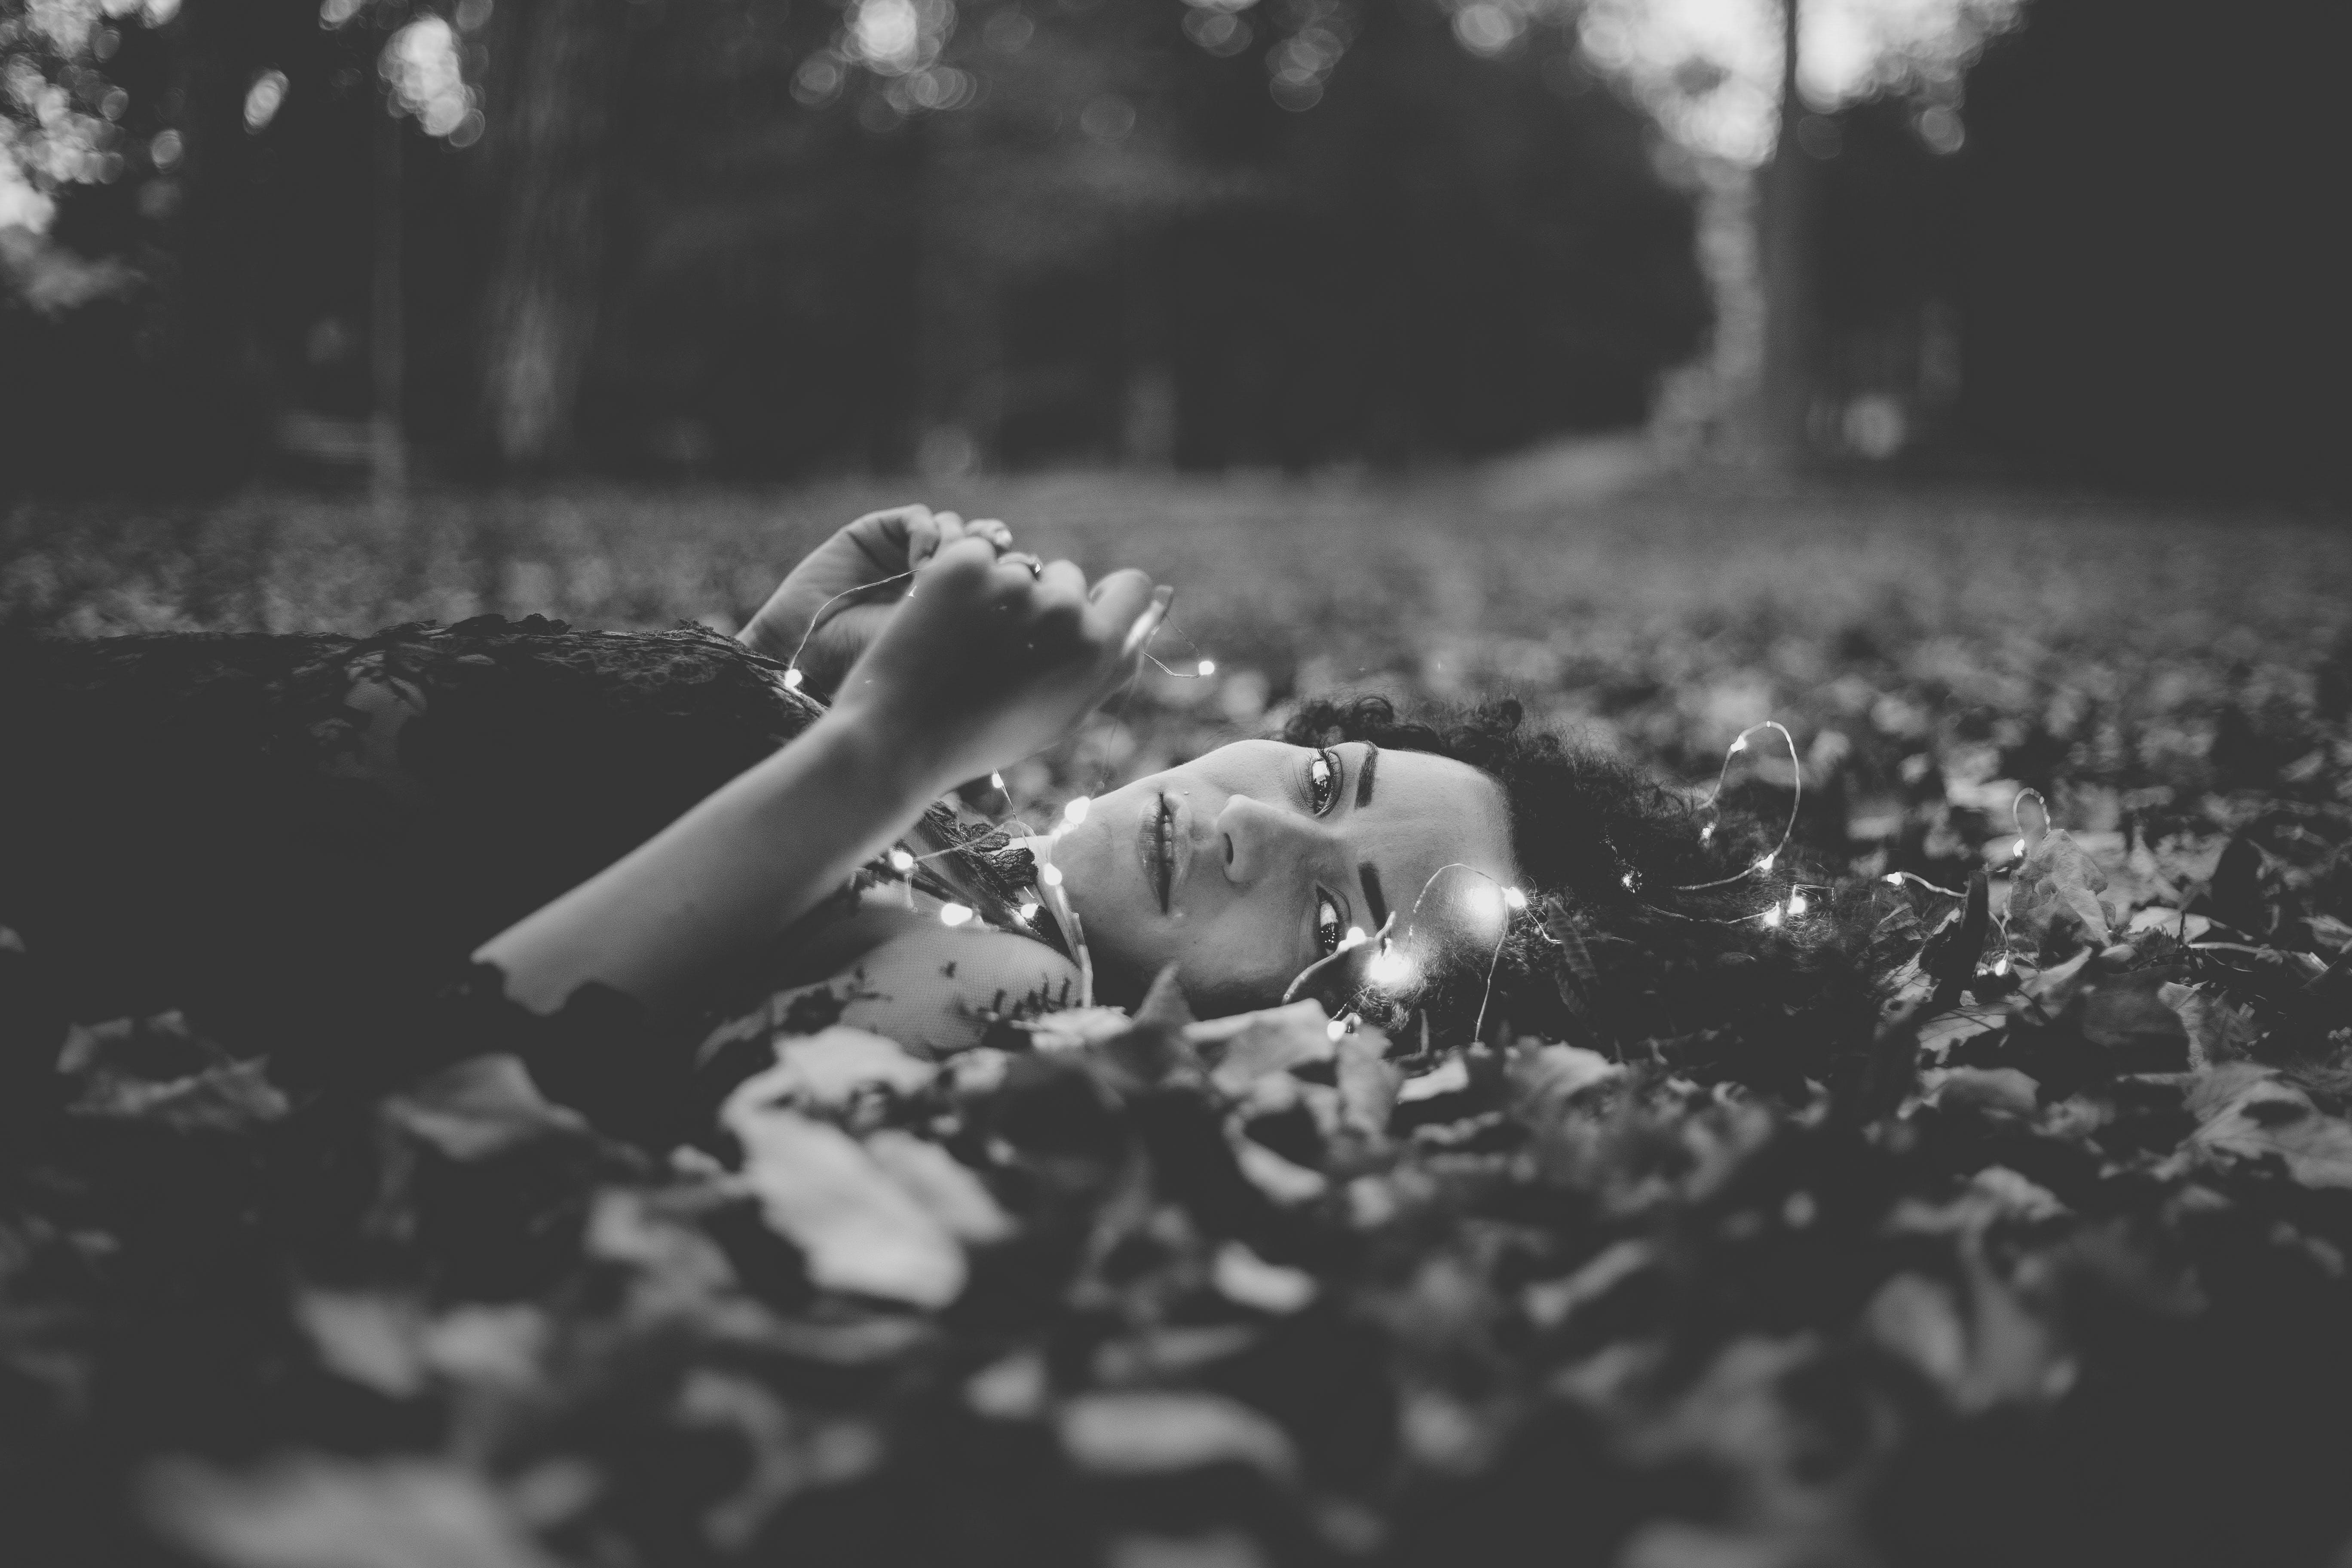 Woman on Leaves